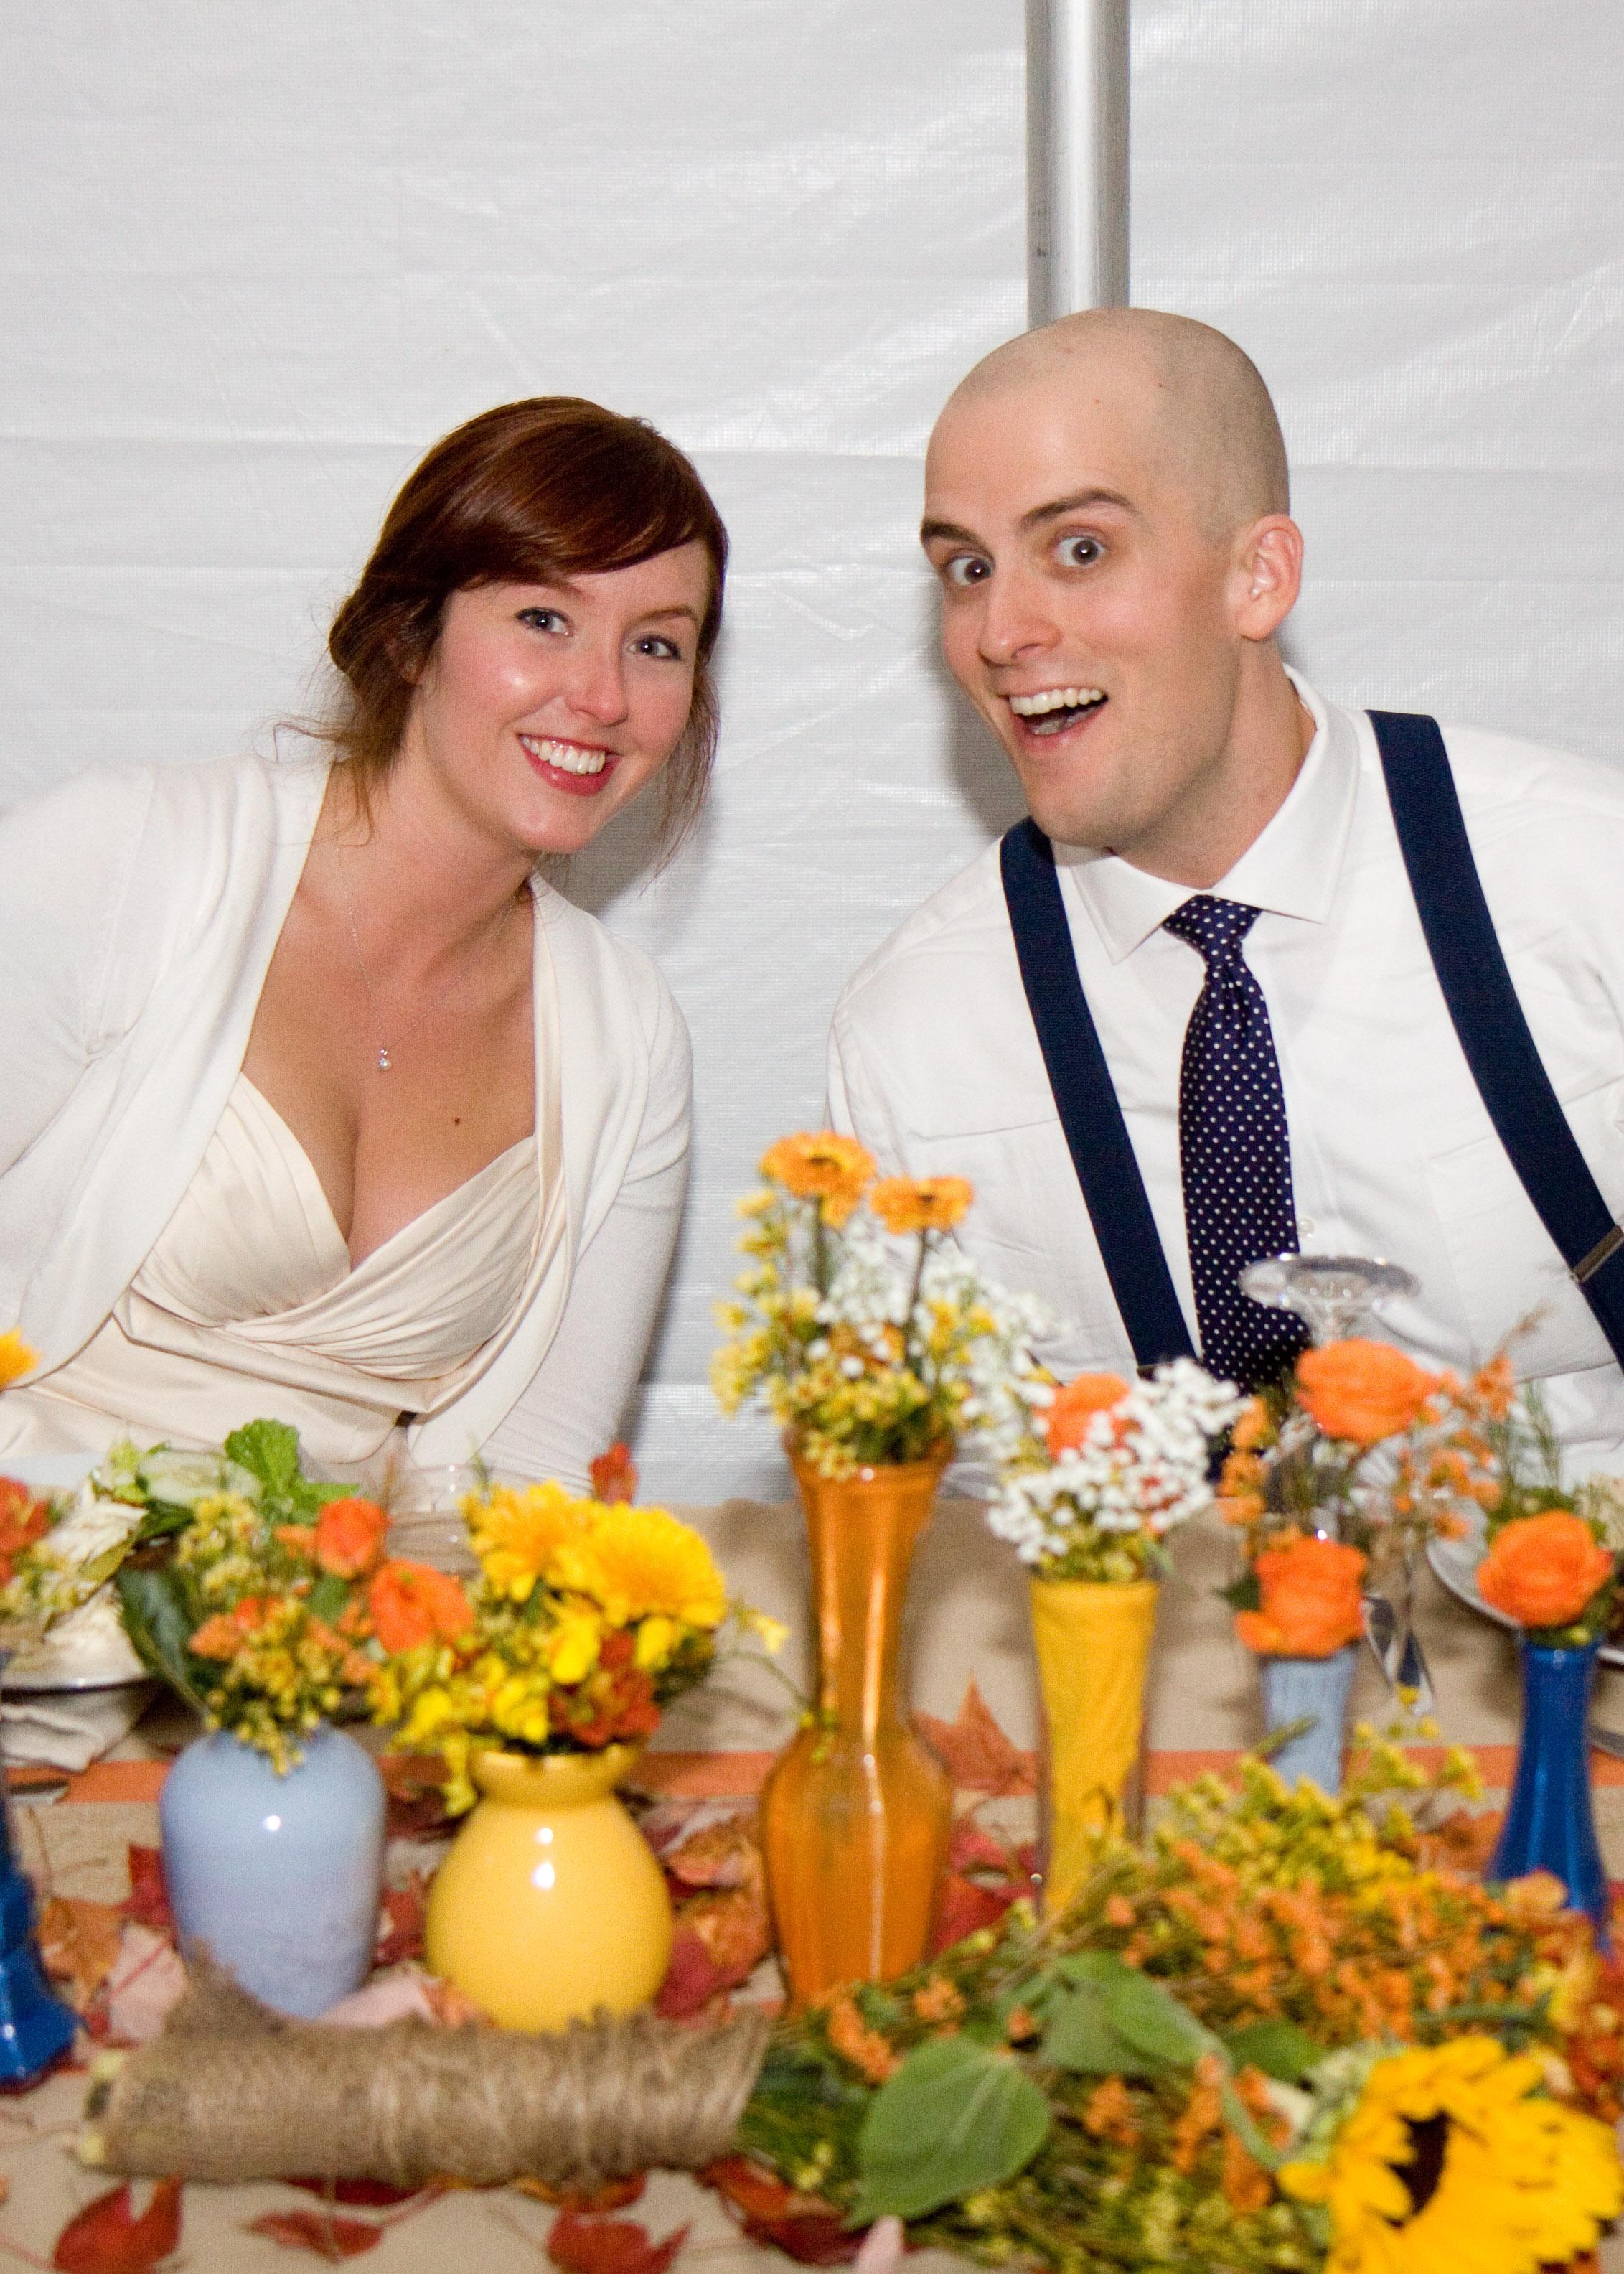 Wilson Bickel Wedding - Reception and Ceremony (305 of 526).jpg